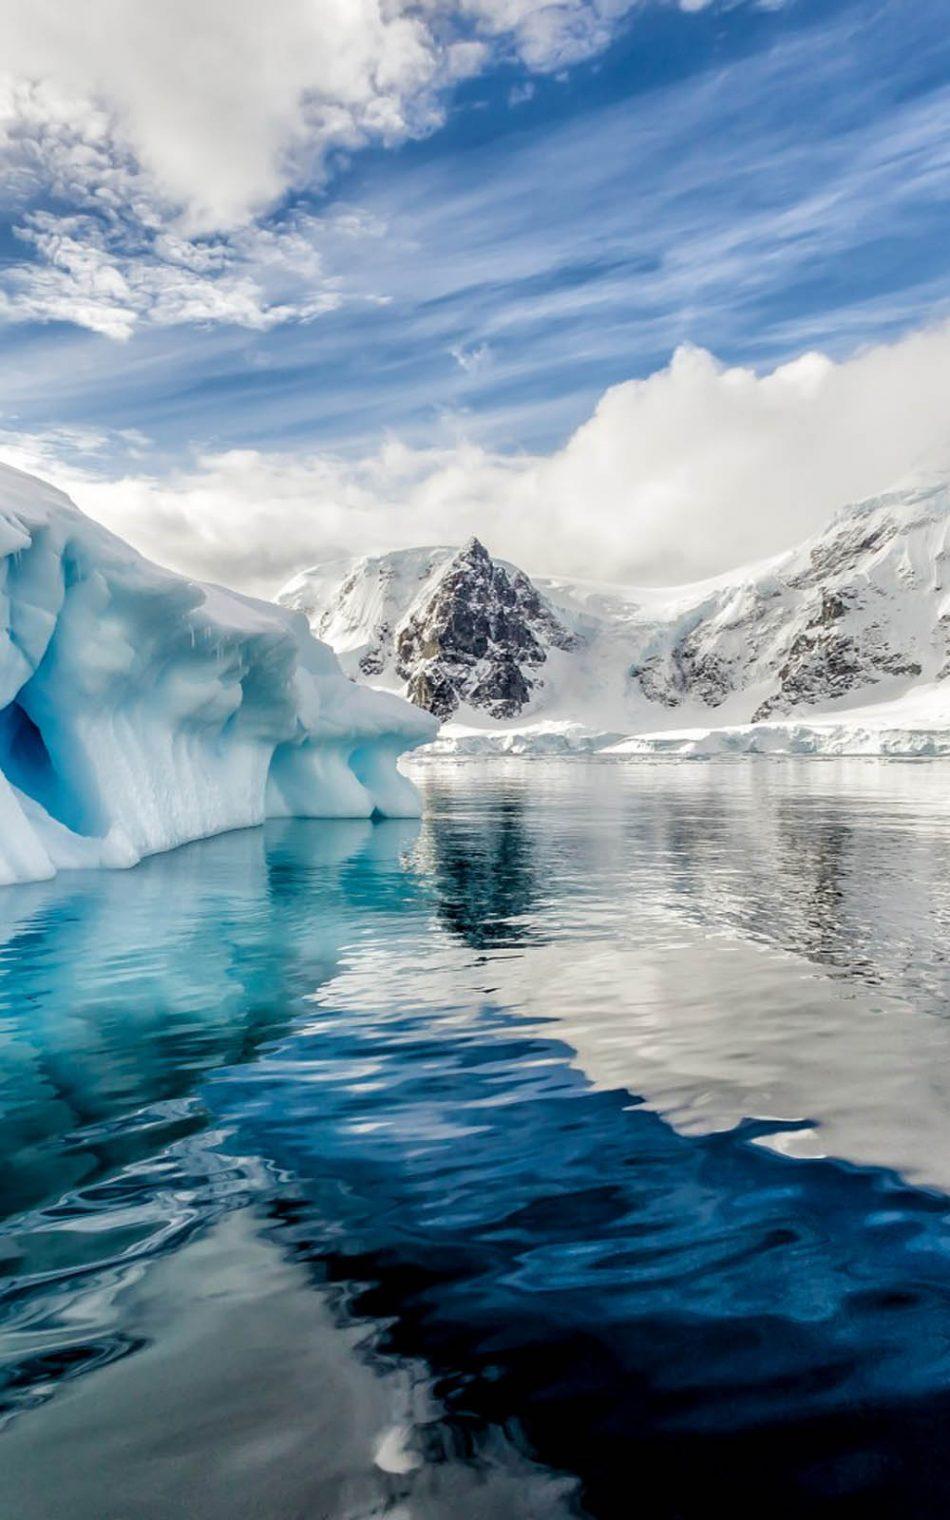 Girl Quotes Wallpapers For Mobile Phones Download Antarctica Iceberg Ocean Free Pure 4k Ultra Hd